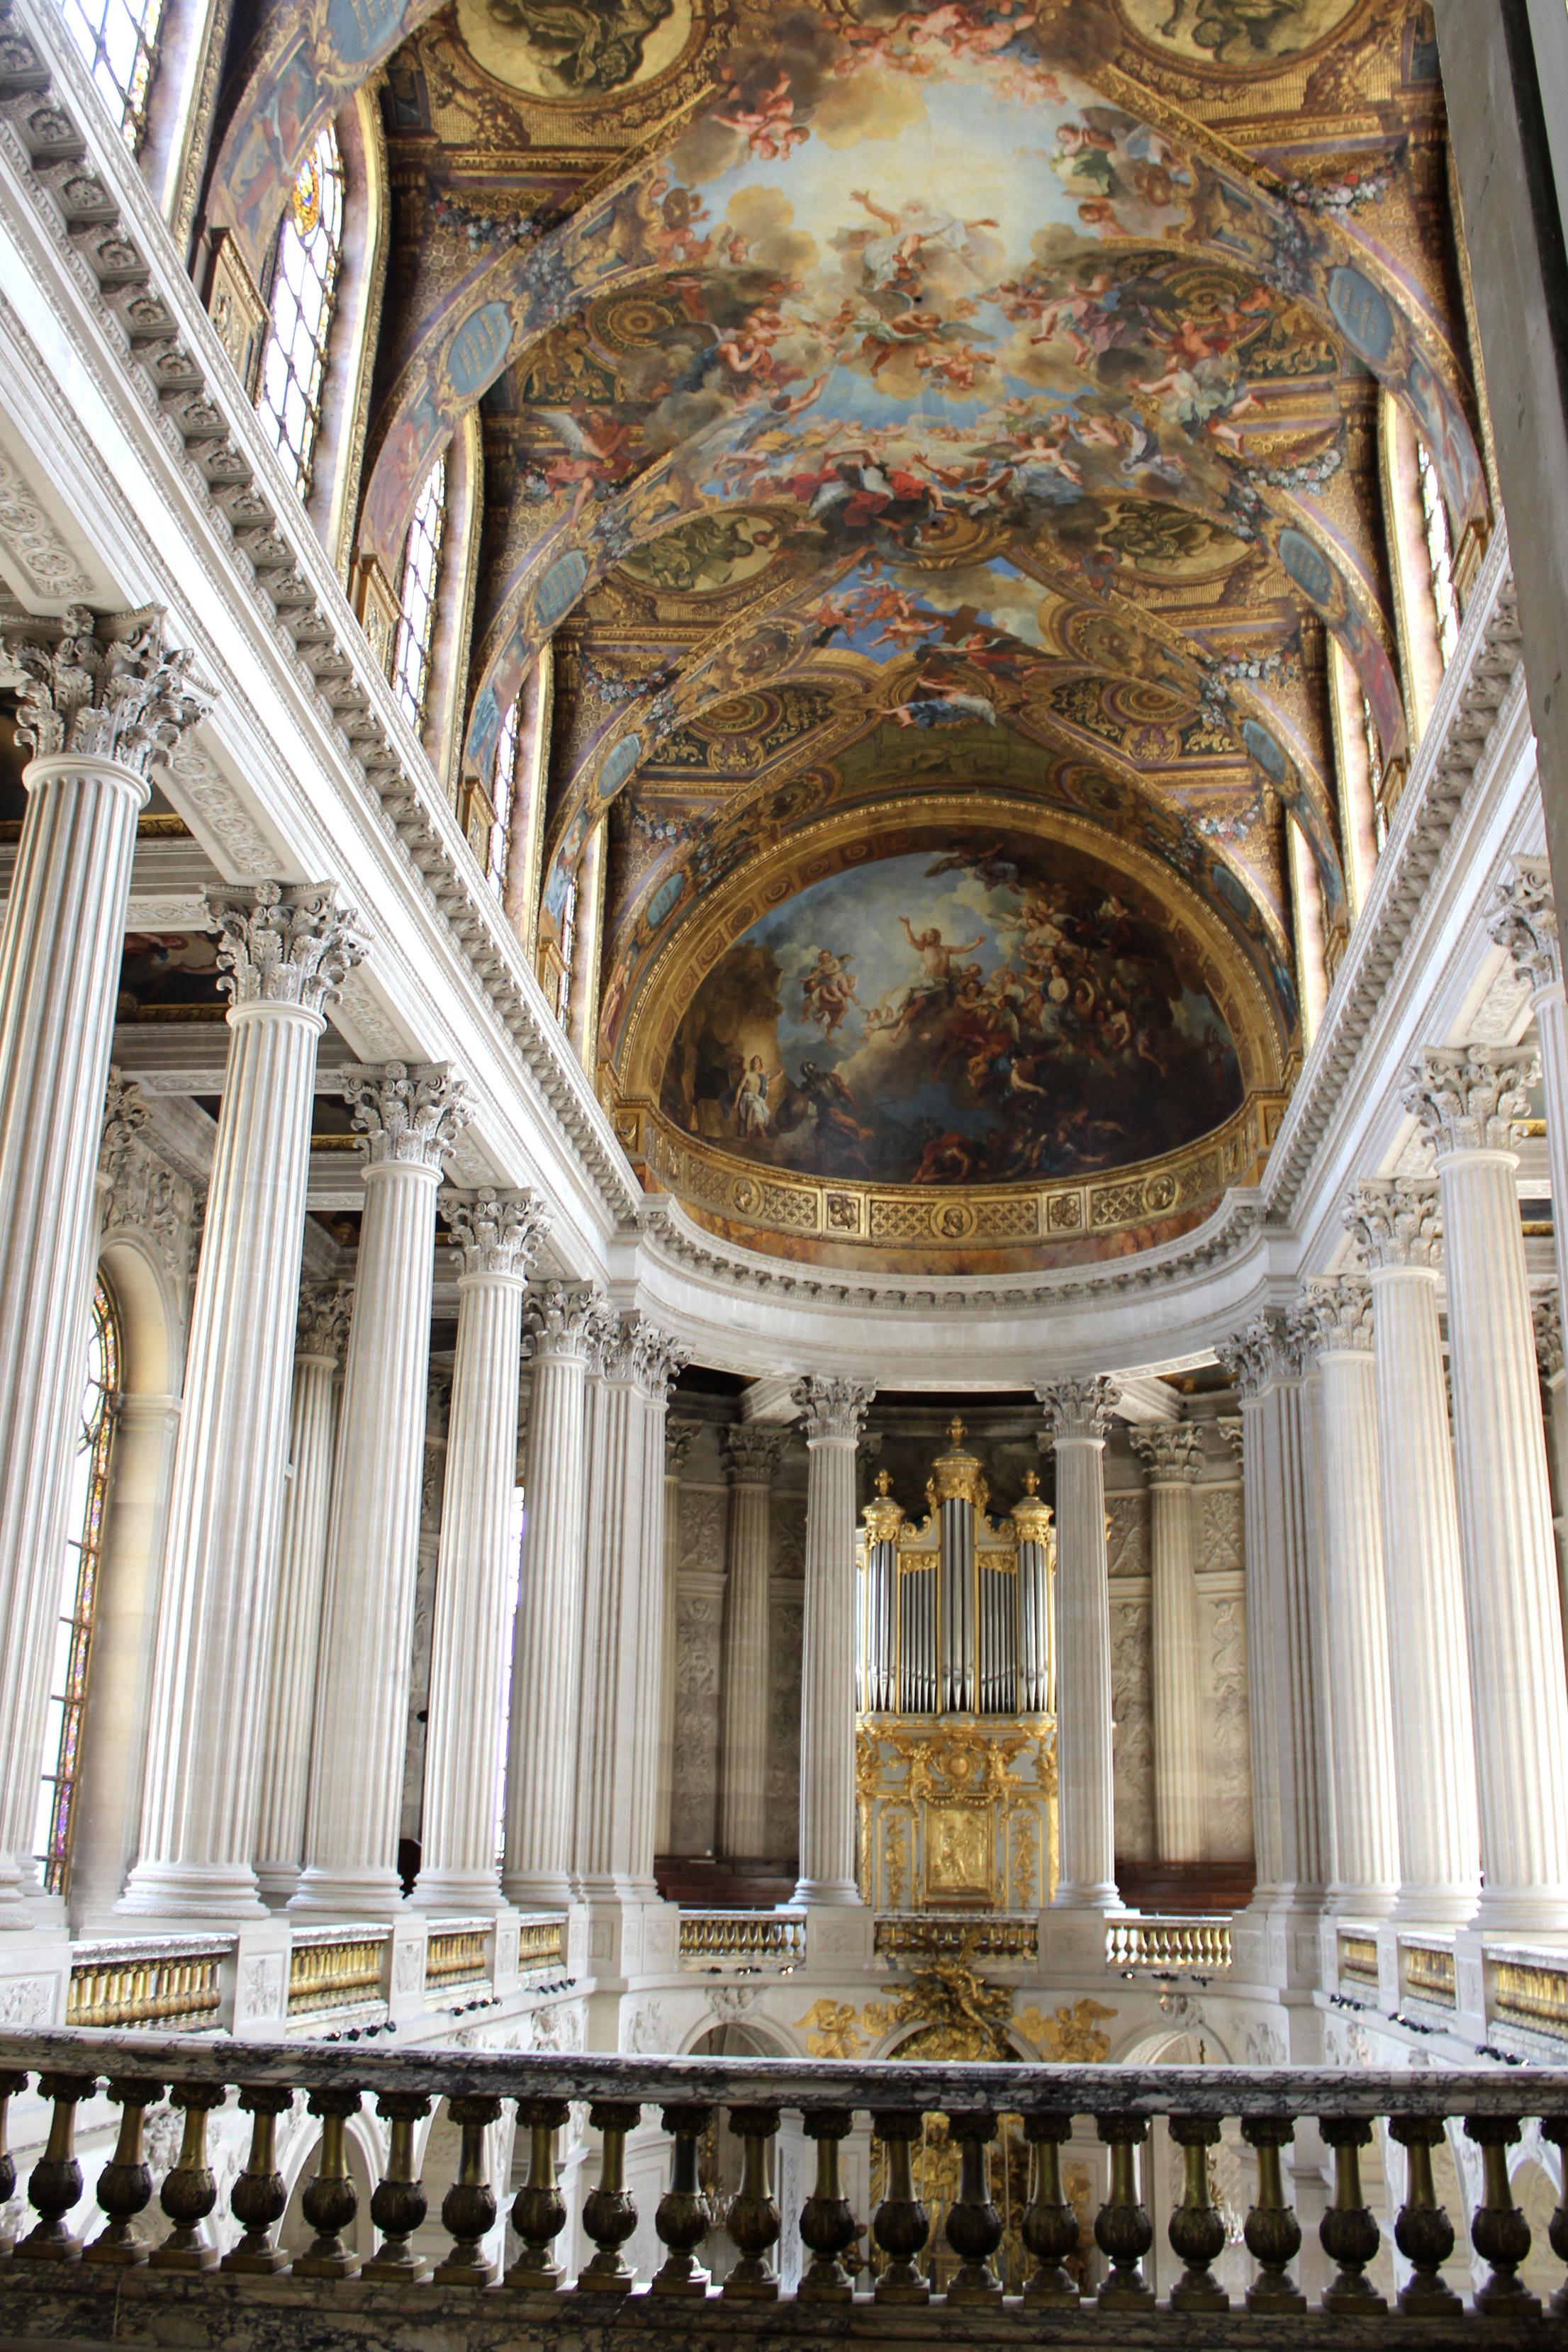 exploring the palace of versailles